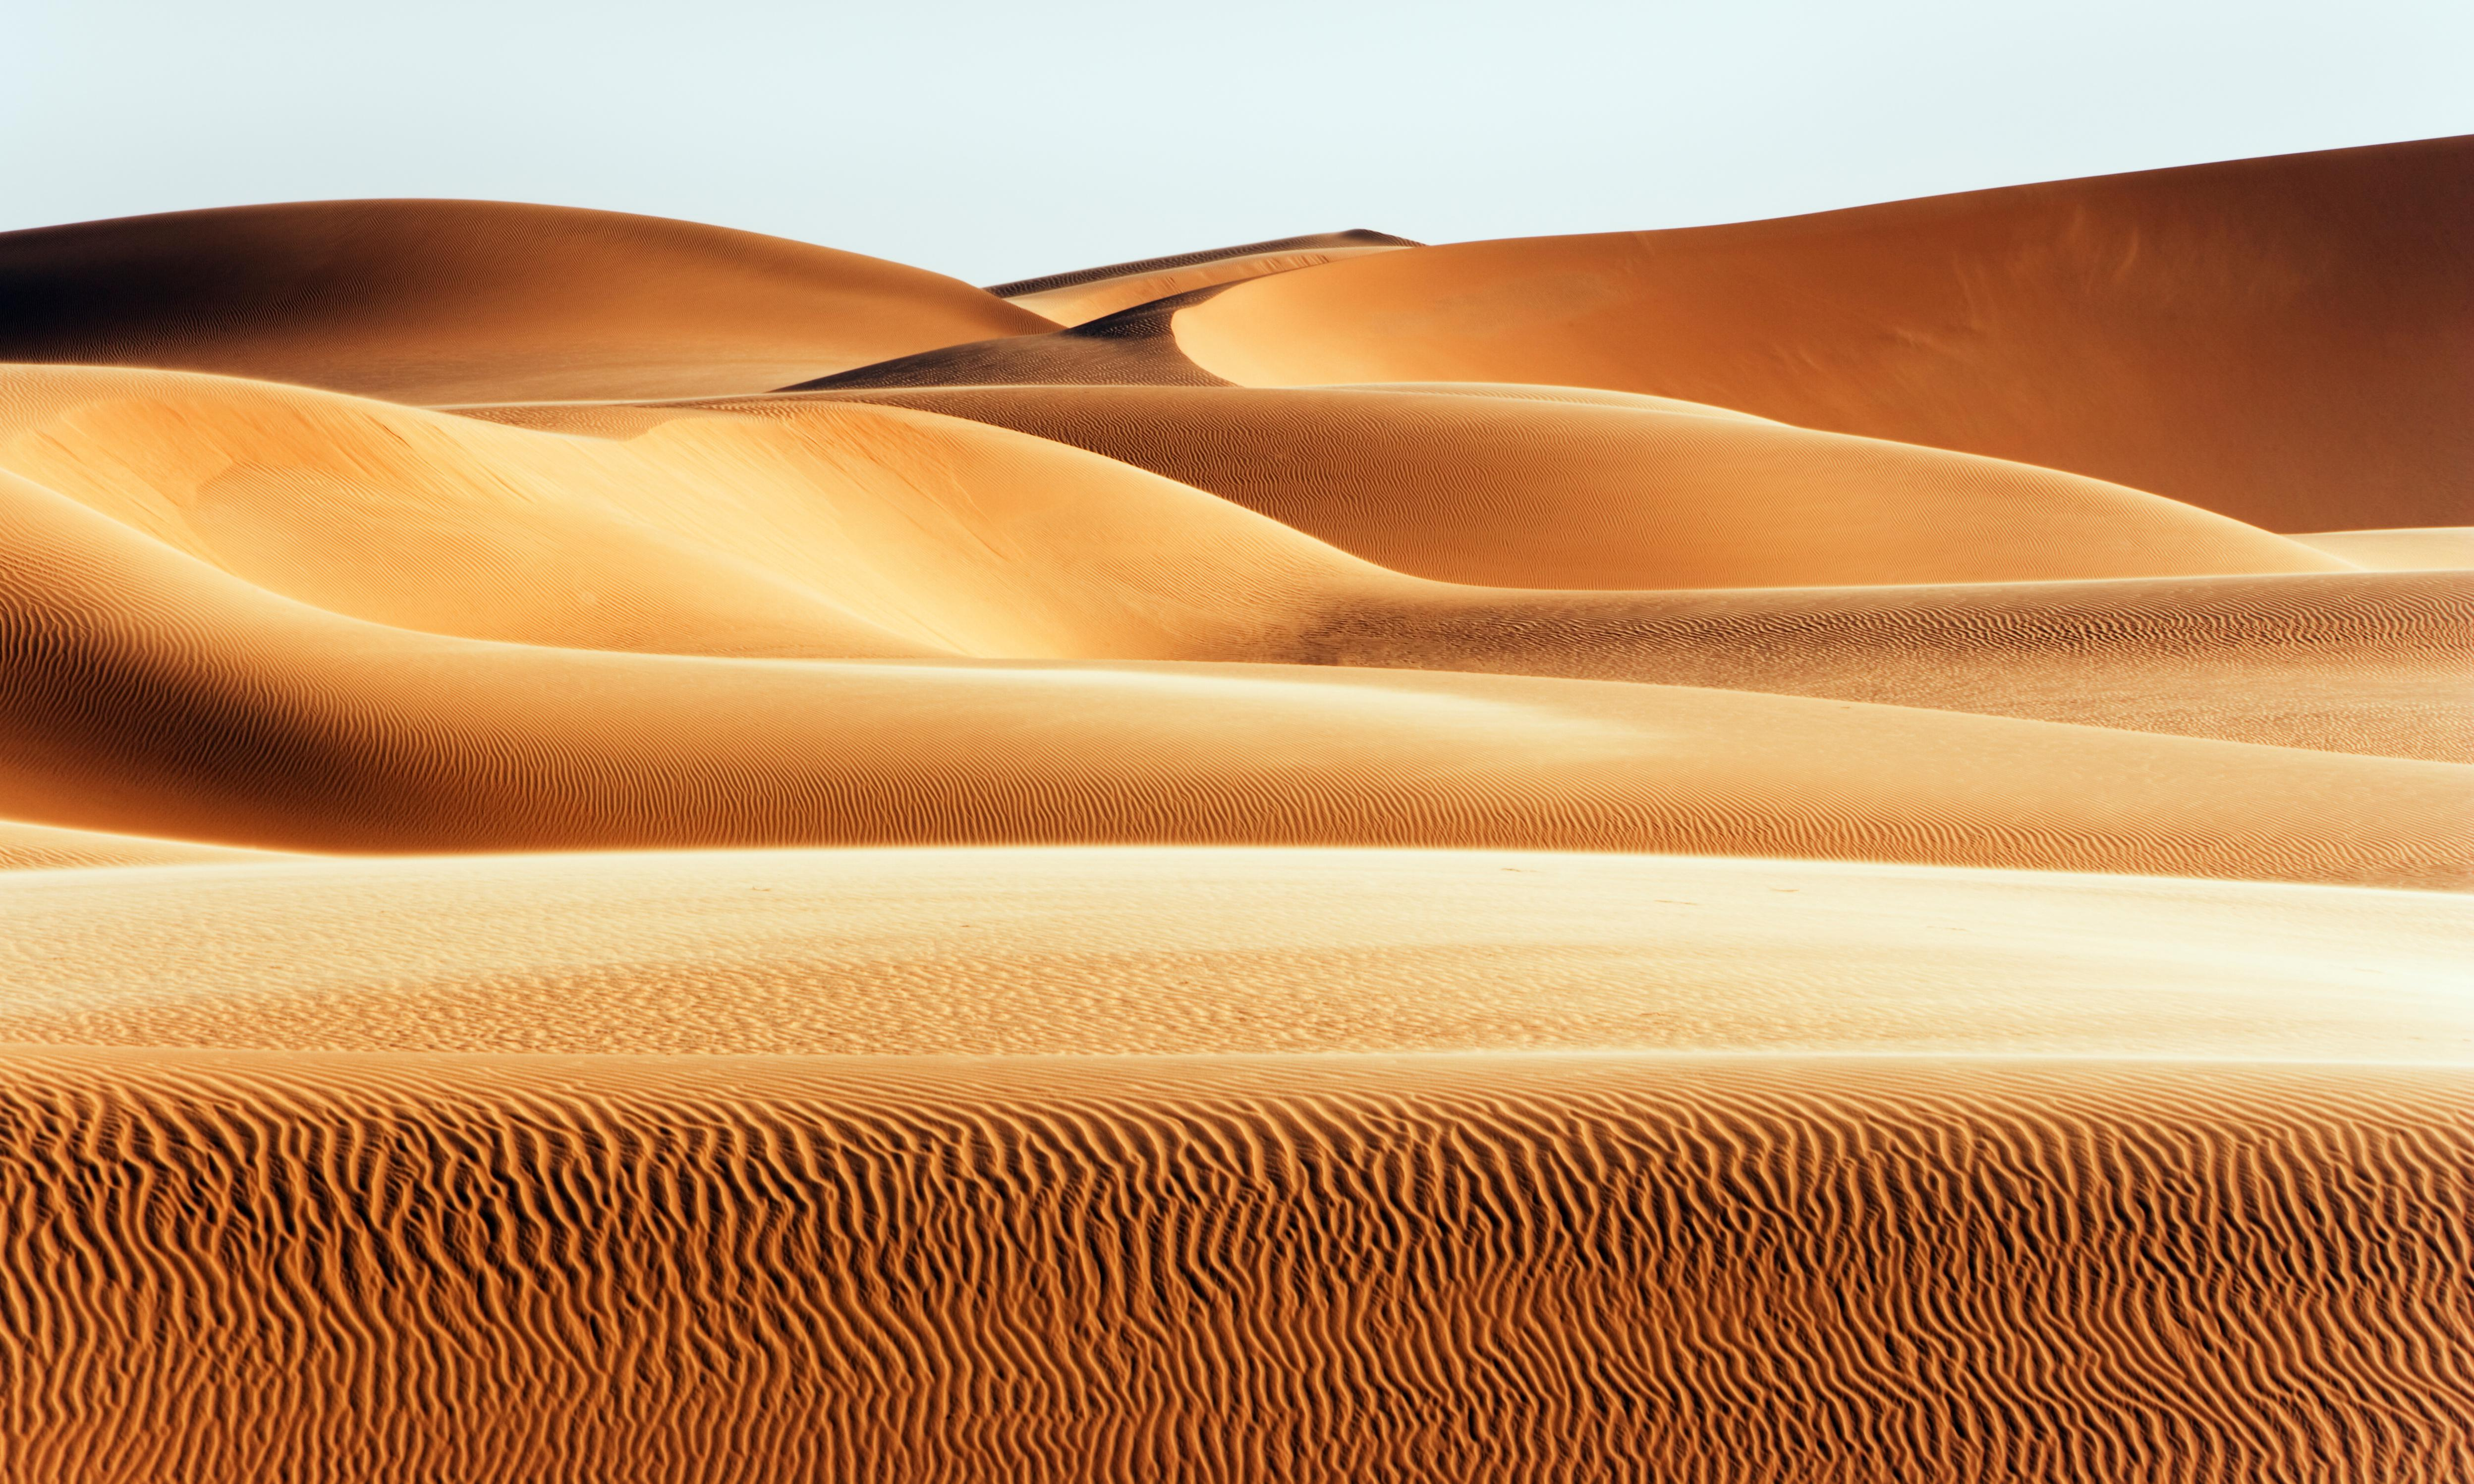 Ancient fish dinners chart Sahara's shift from savannah to desert